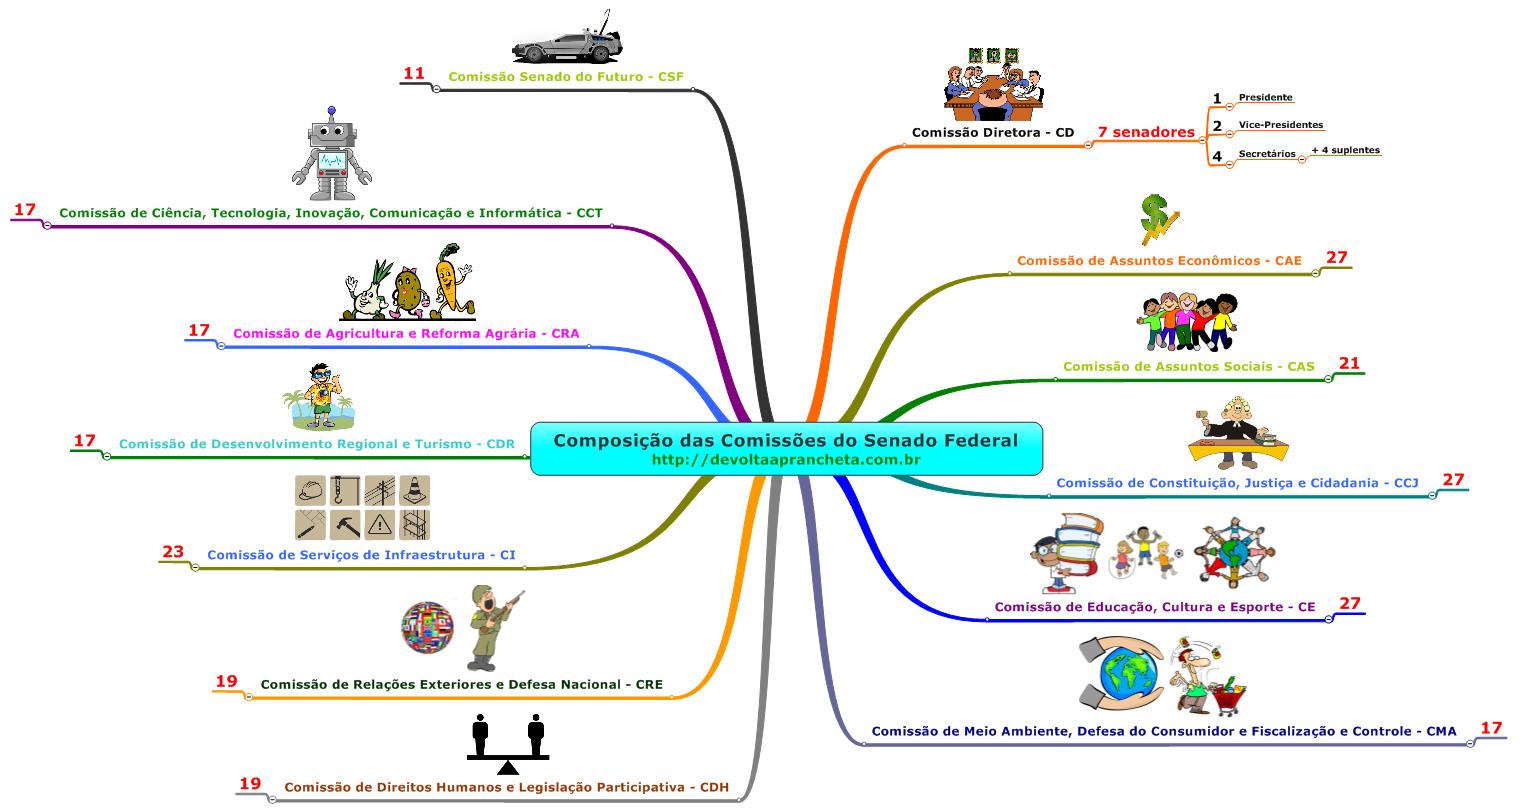 mapa-mental-tradicional-comissoes-senado-federal